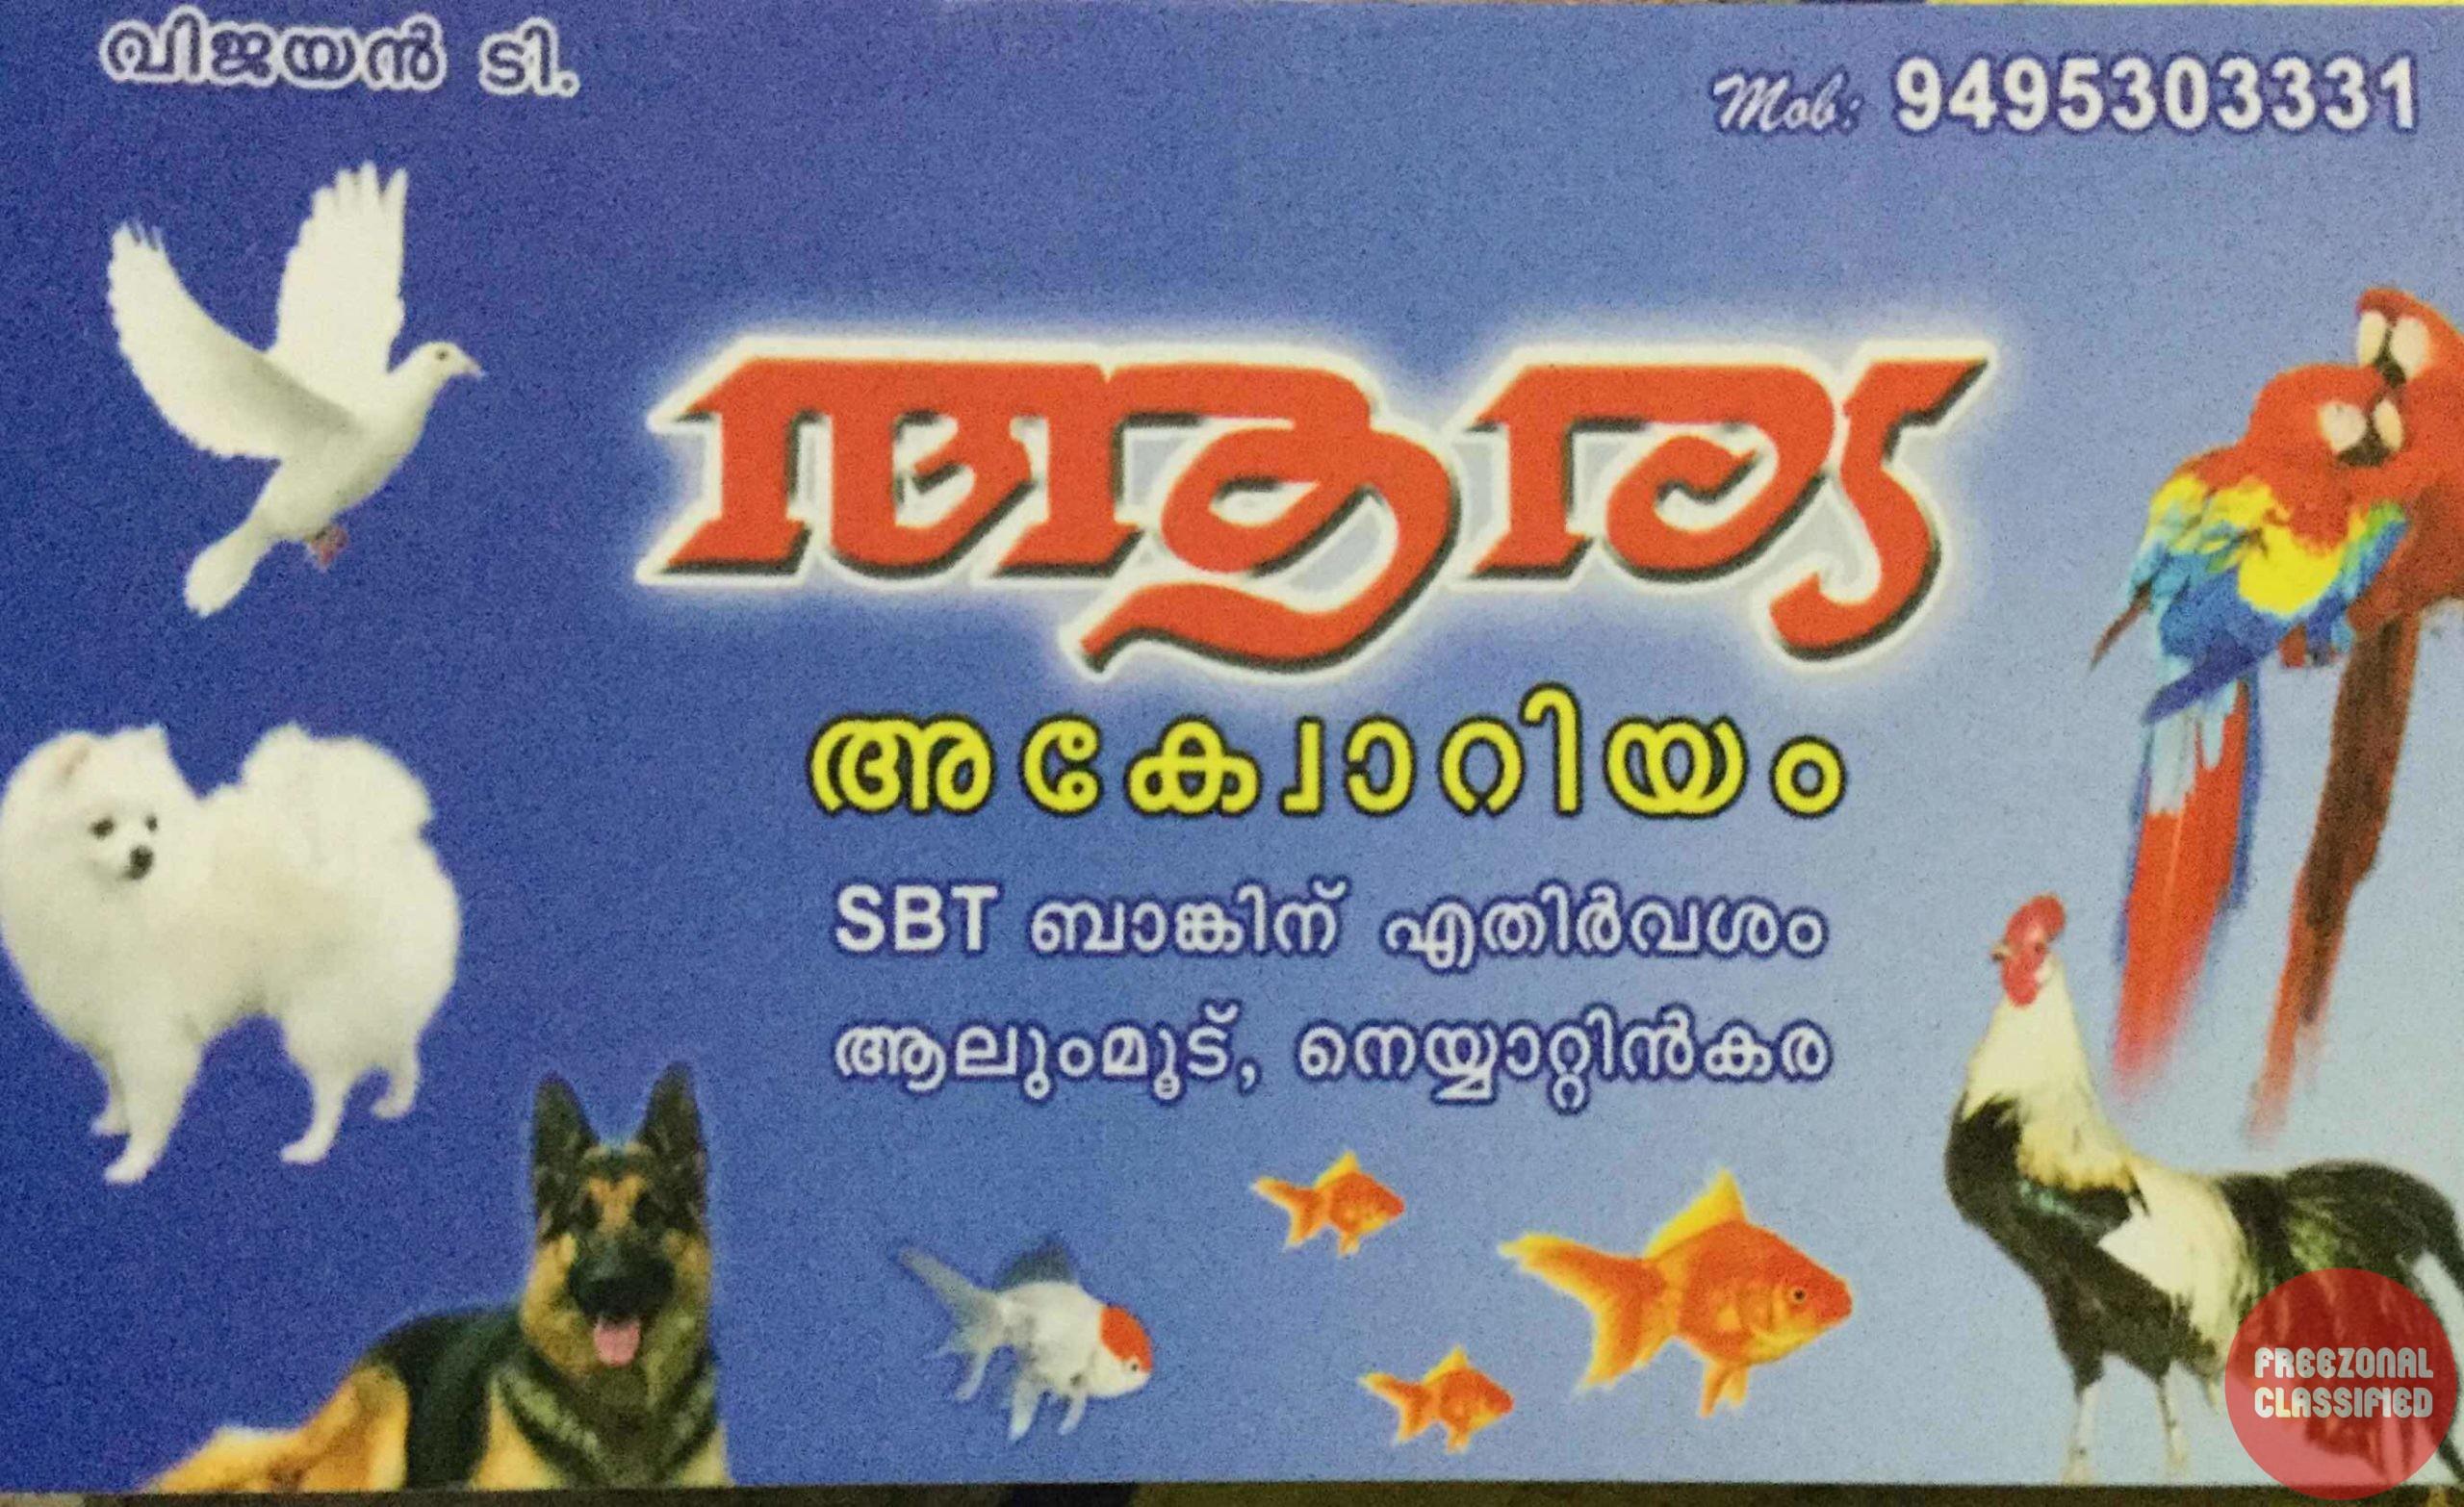 Arya Aquarium Pet Shop In Neyyattinkara Thiruvananthapuram Kerala Reviews Offers Contact Numbers Details Rating